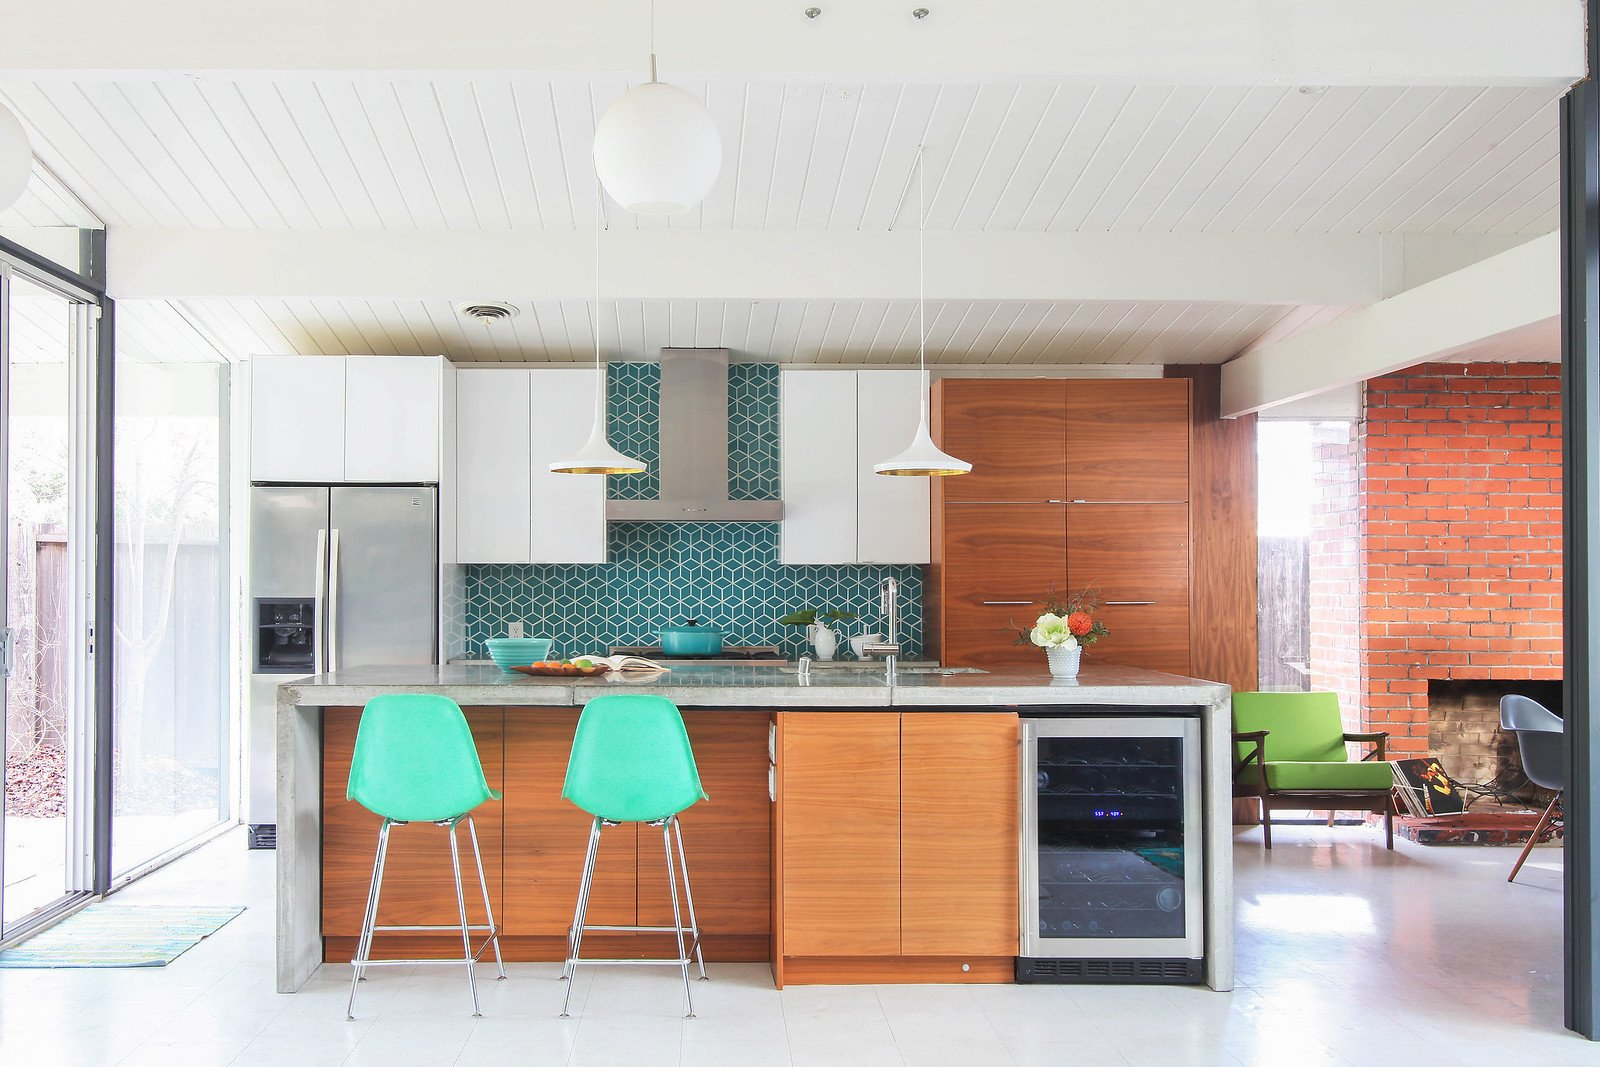 Kitchen, Ceramic Tile, Refrigerator, White, Undermount, Wood, Wine Cooler, Vinyl, Concrete, Range Hood, and Pendant  Kitchen Vinyl White Range Hood Photos from Walnut Creek Eichler Renovation